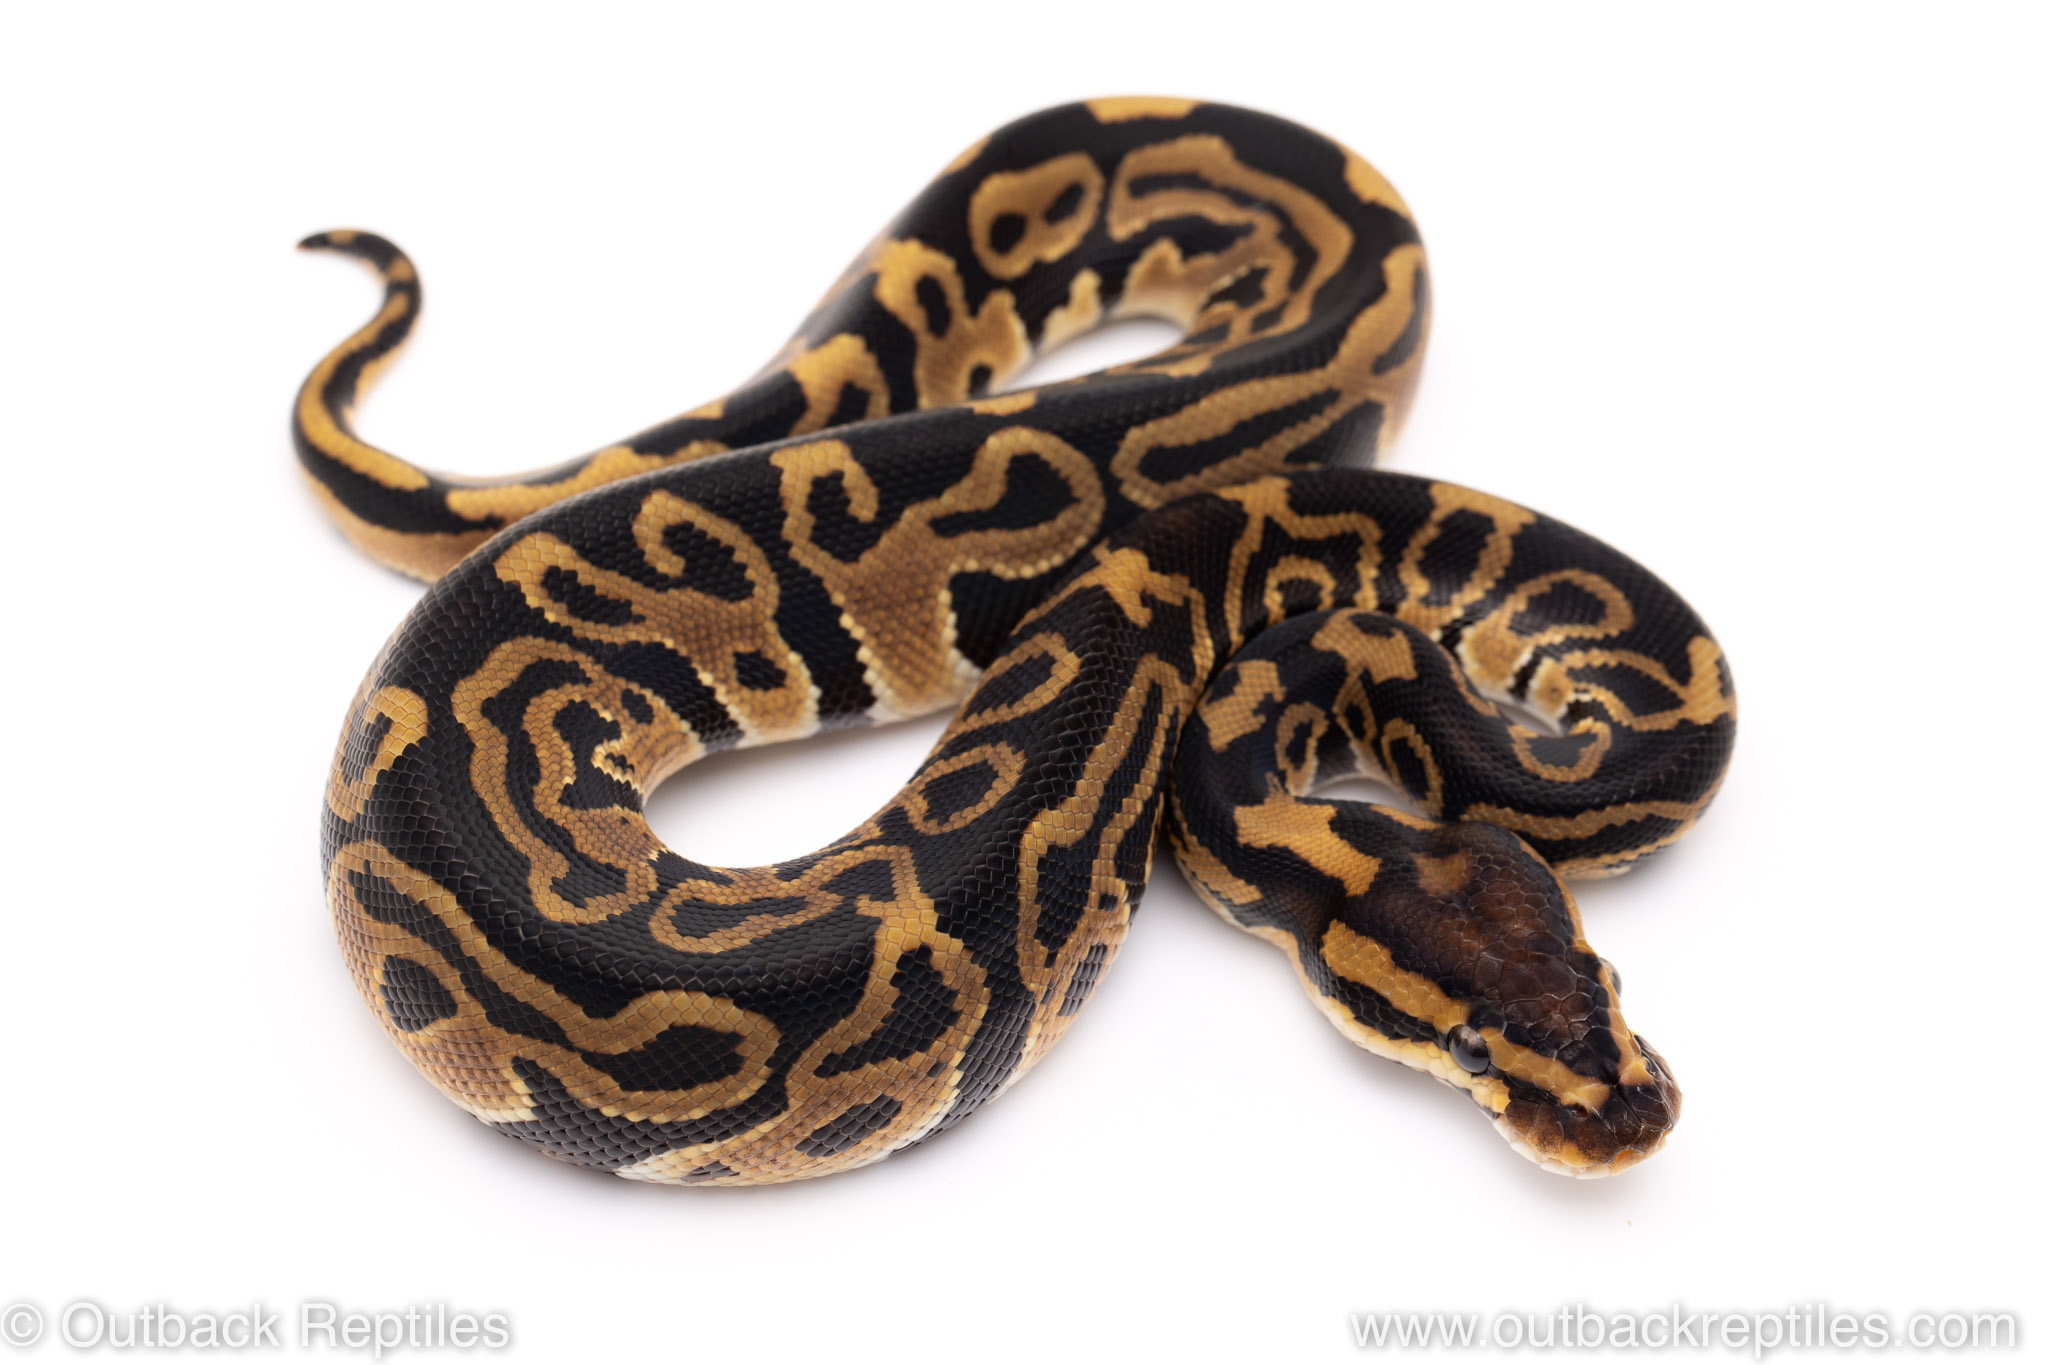 Leopard het Clown ball python for sale